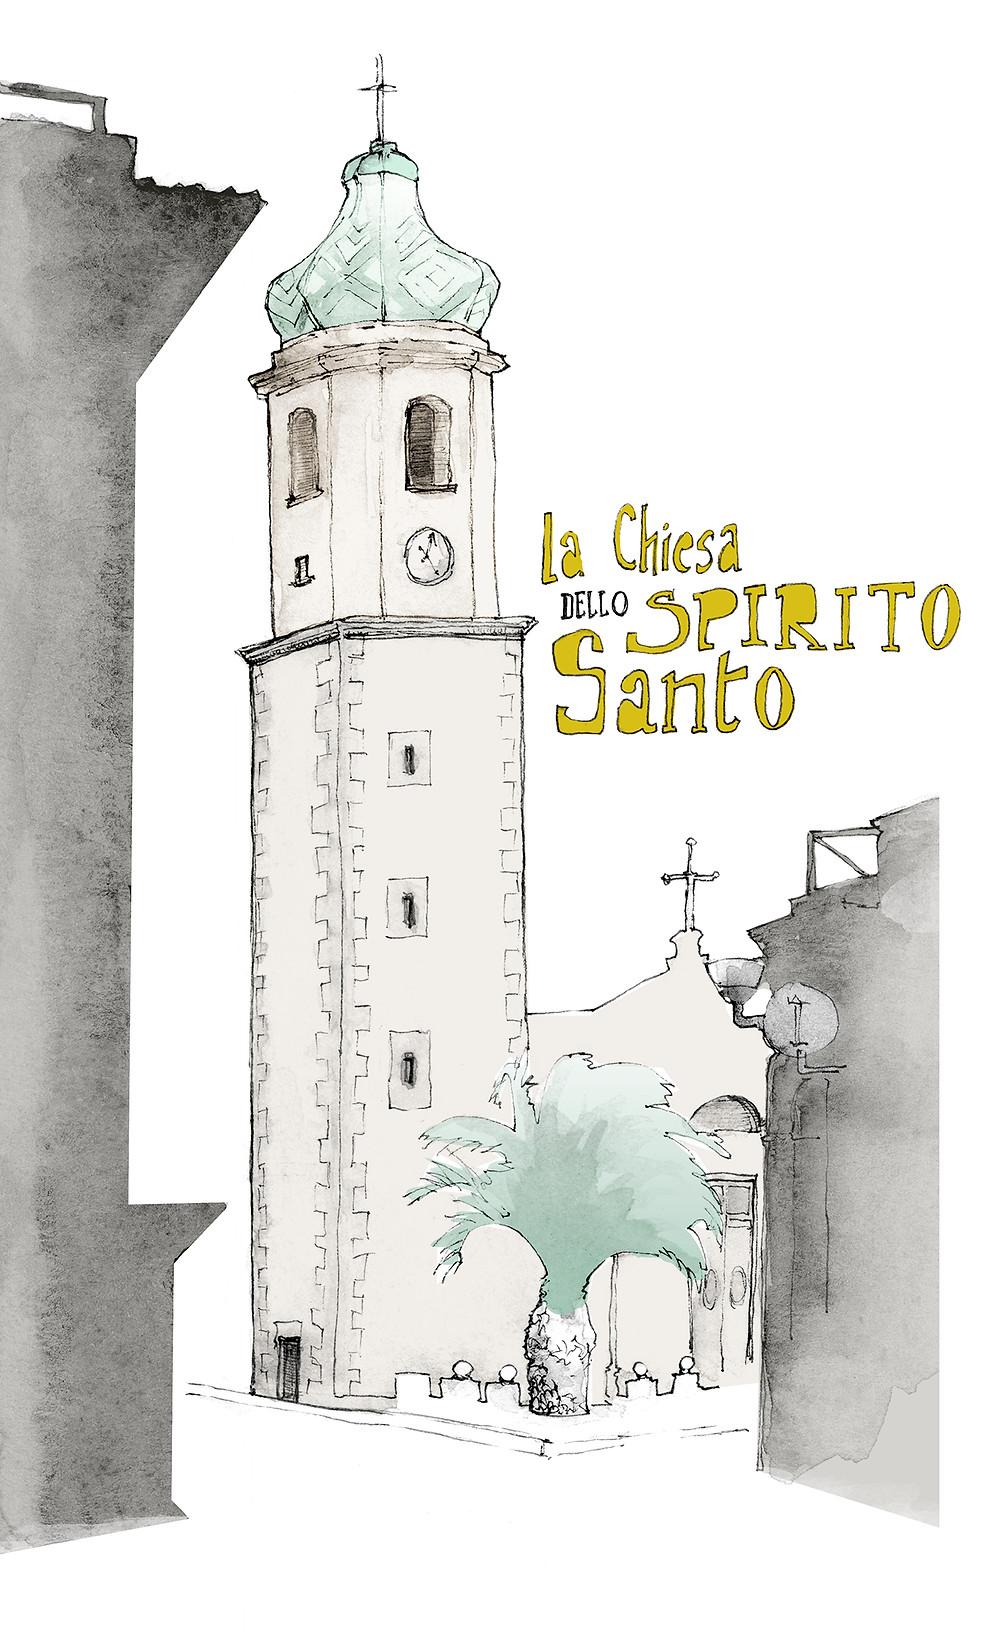 Blog Viaggi Italia marcellooo.fr Cabras disegno Jdan Sardegna